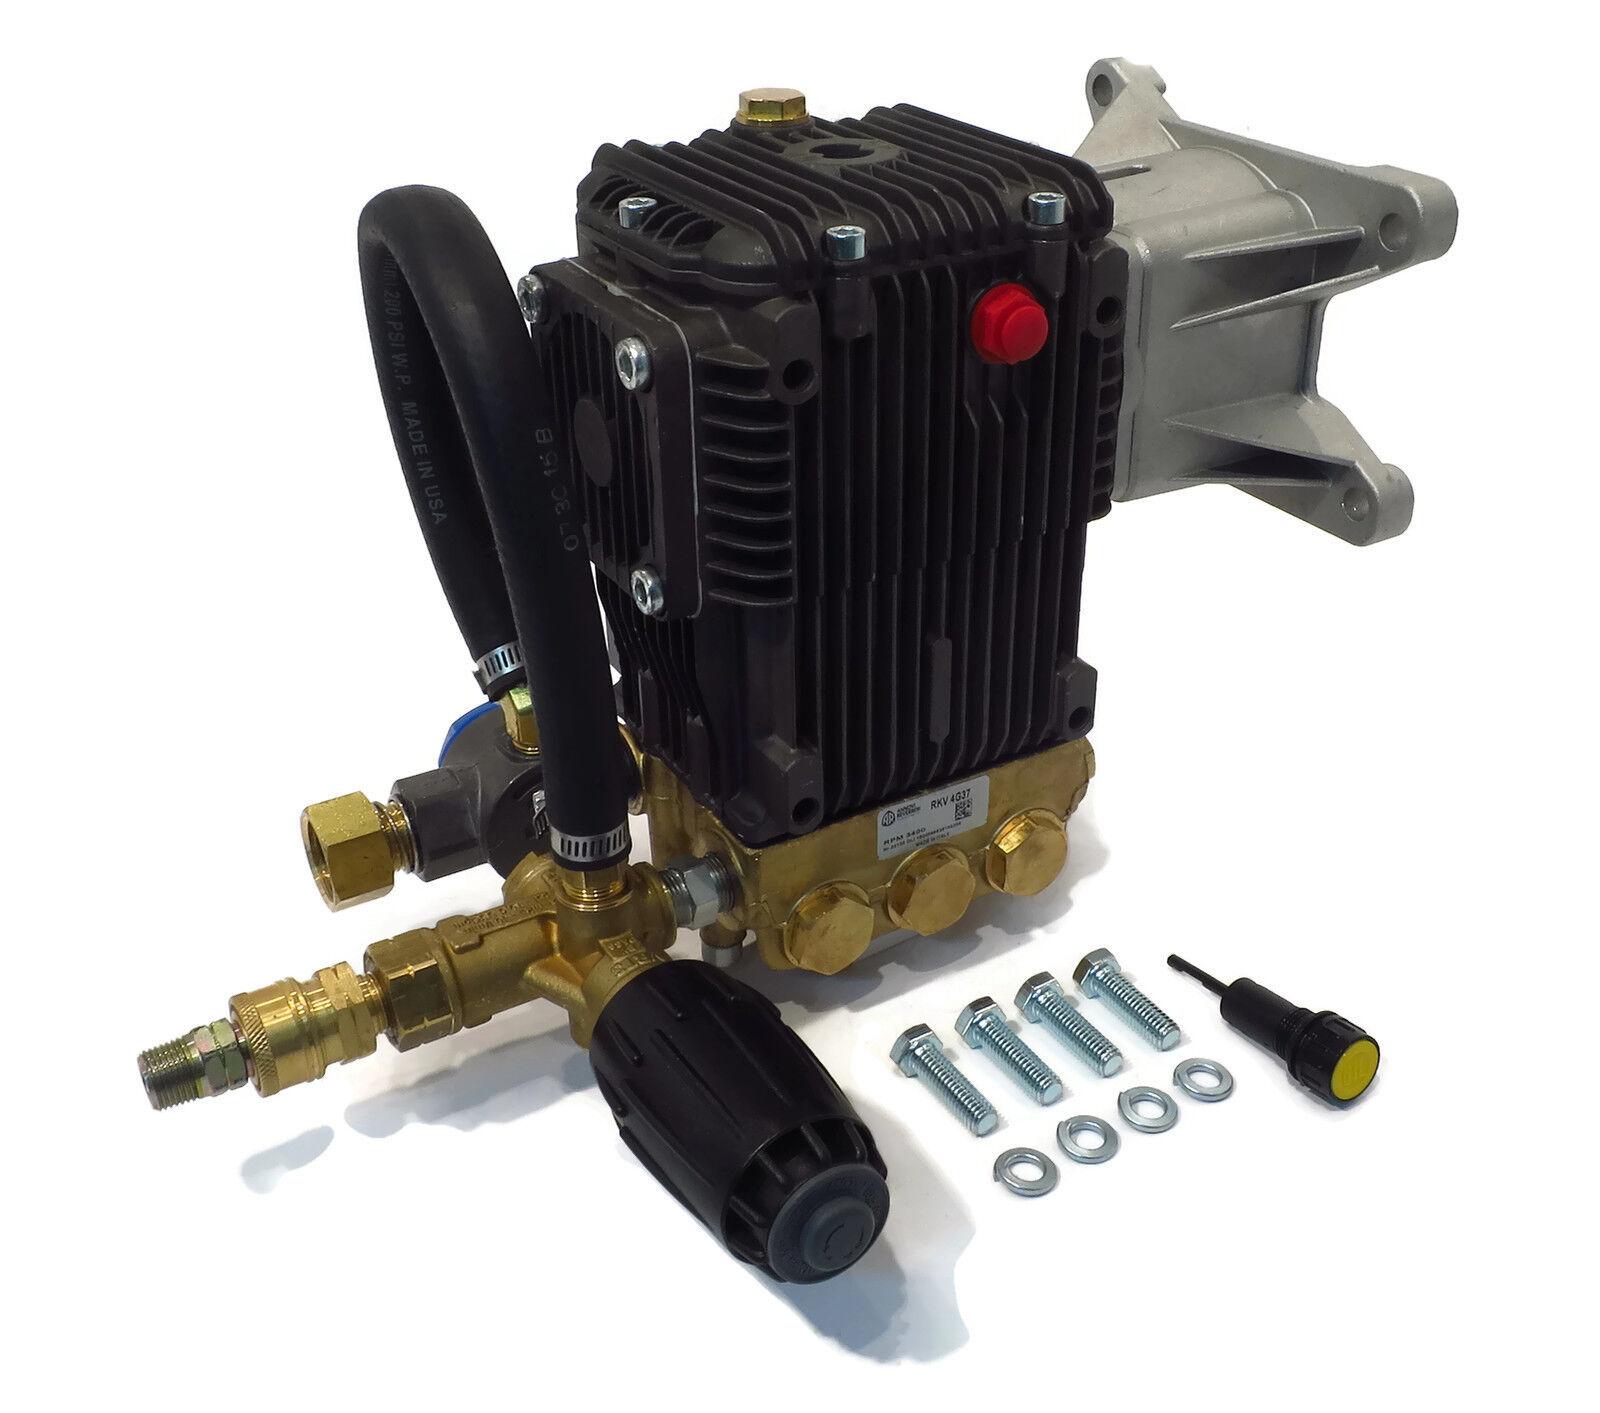 3700 PSI presión de alimentación Rkv bomba de agua Lavado Bomba & VRT3 Troy - 020210-0 020210-1 Bilt Built